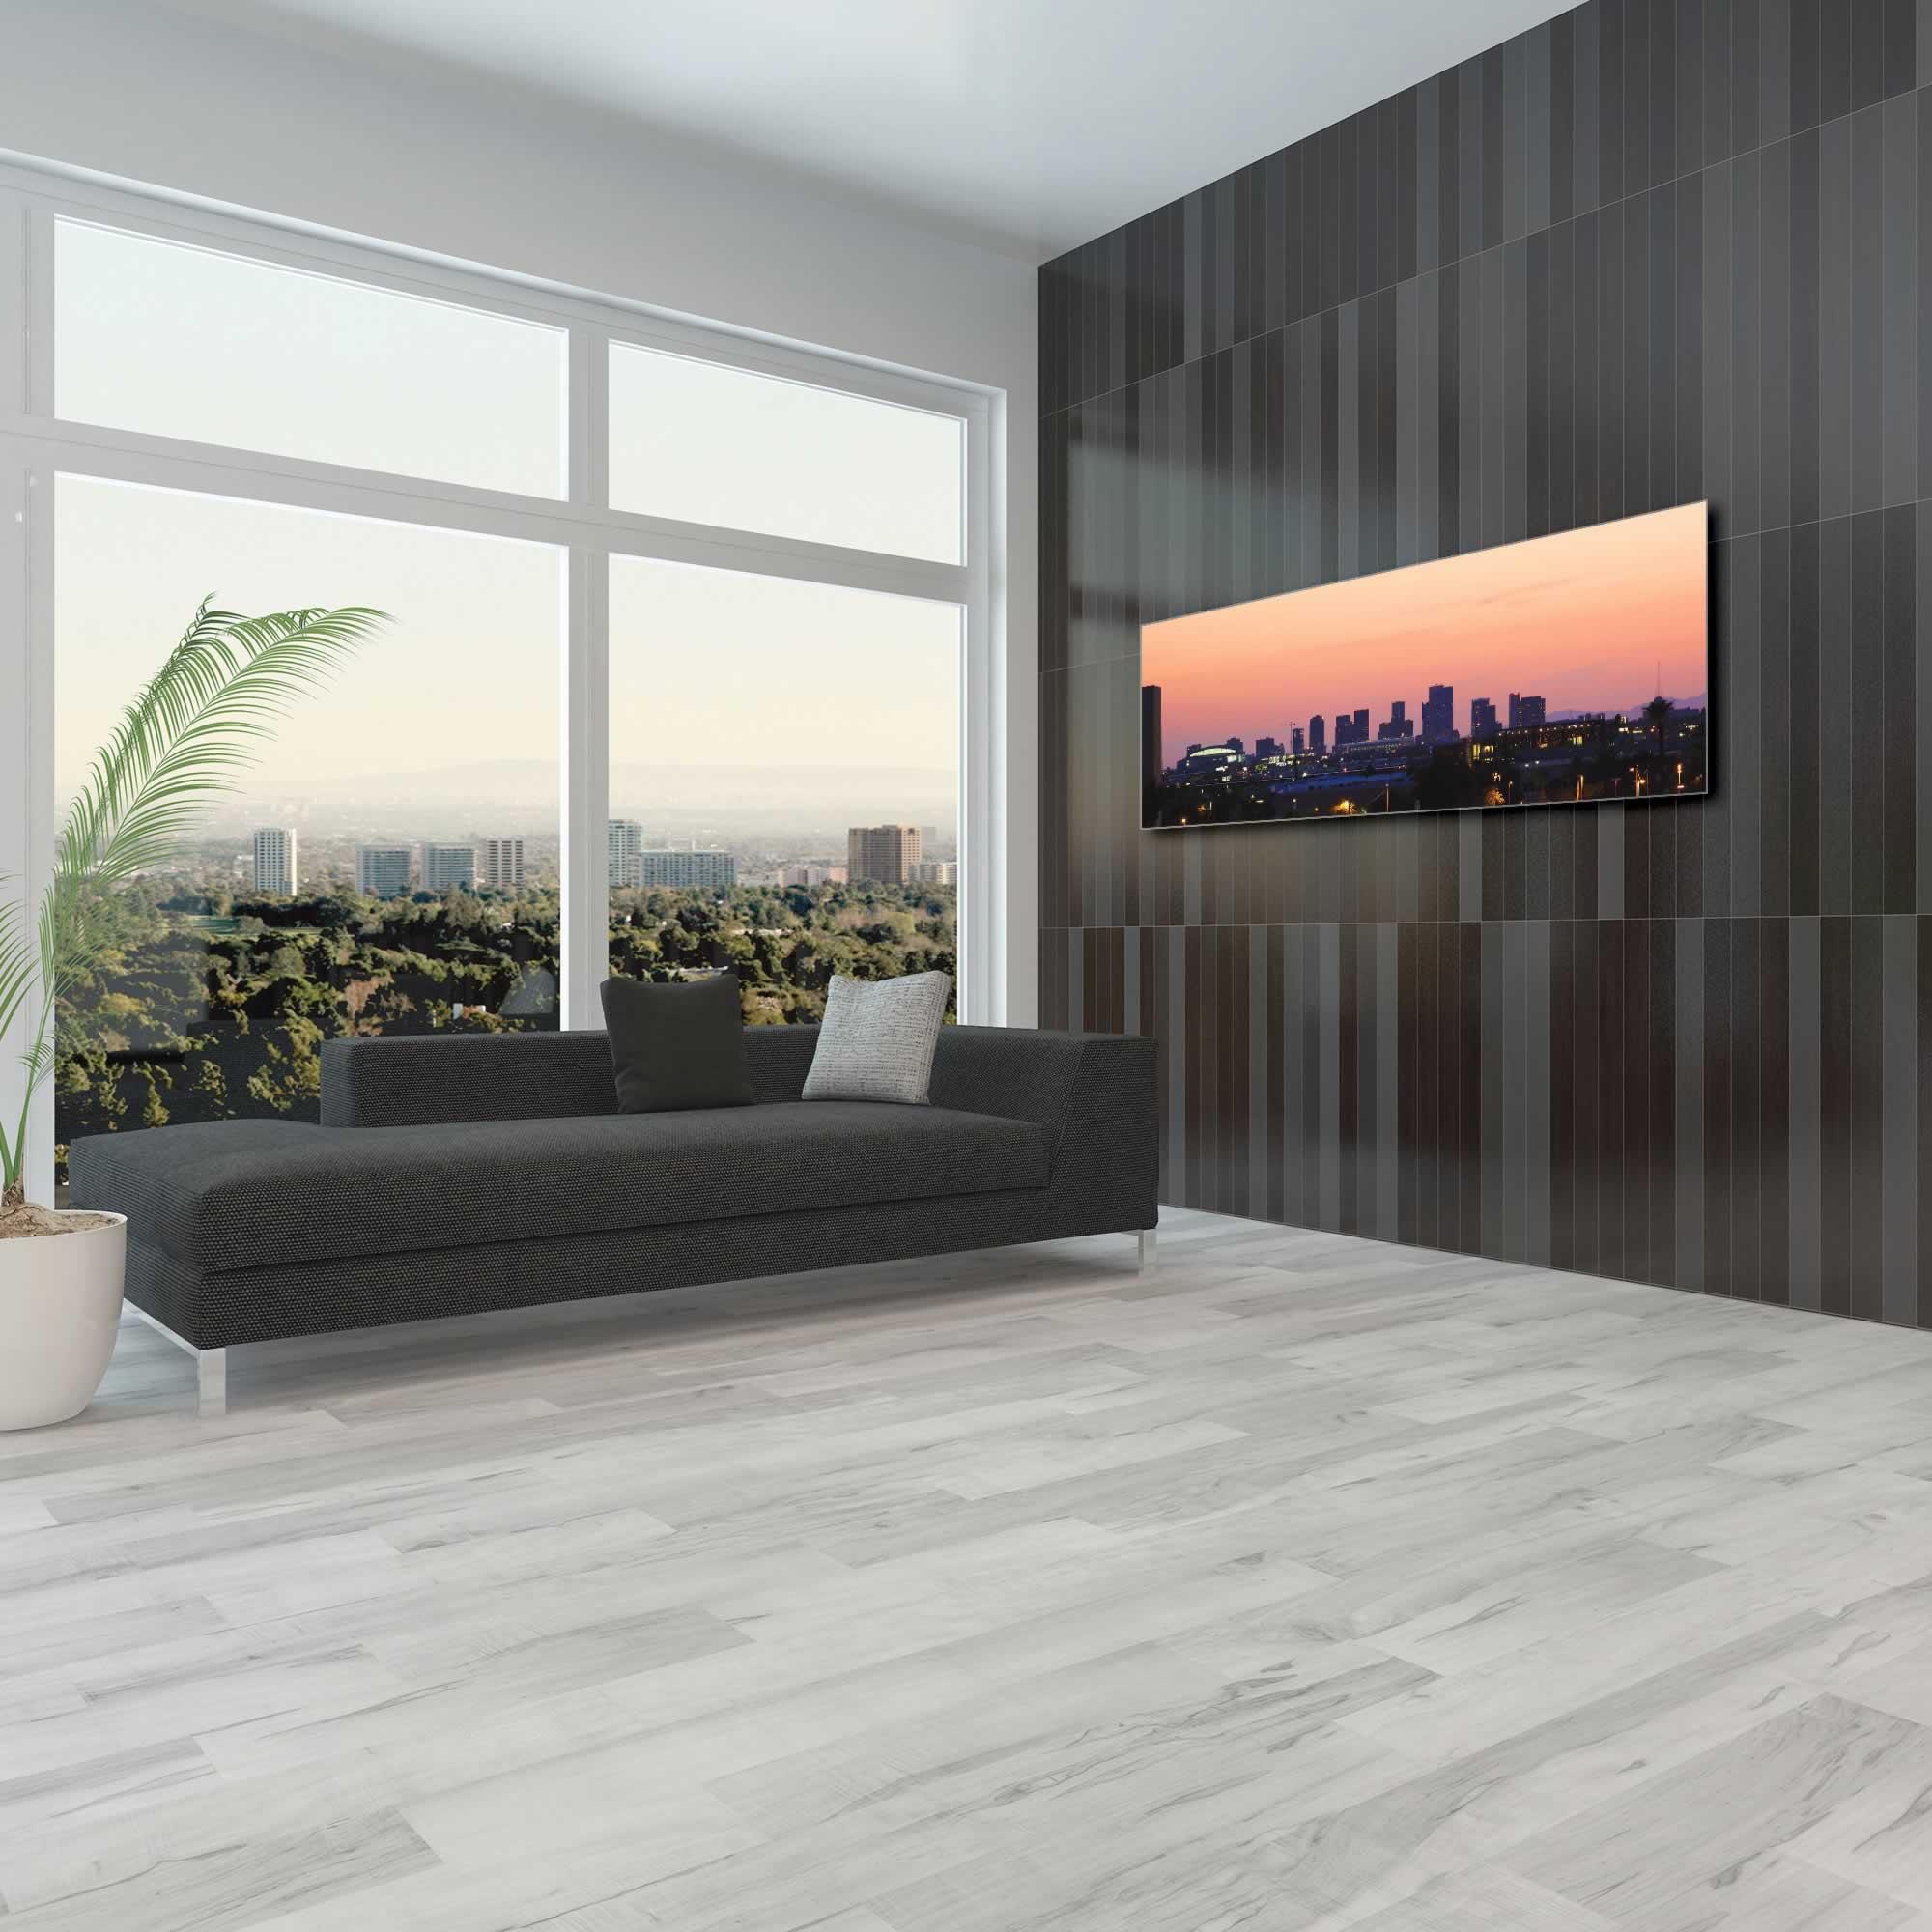 Phoenix City Skyline - Urban Modern Art, Designer Home Decor, Cityscape Wall Artwork, Trendy Contemporary Art - Alternate View 1